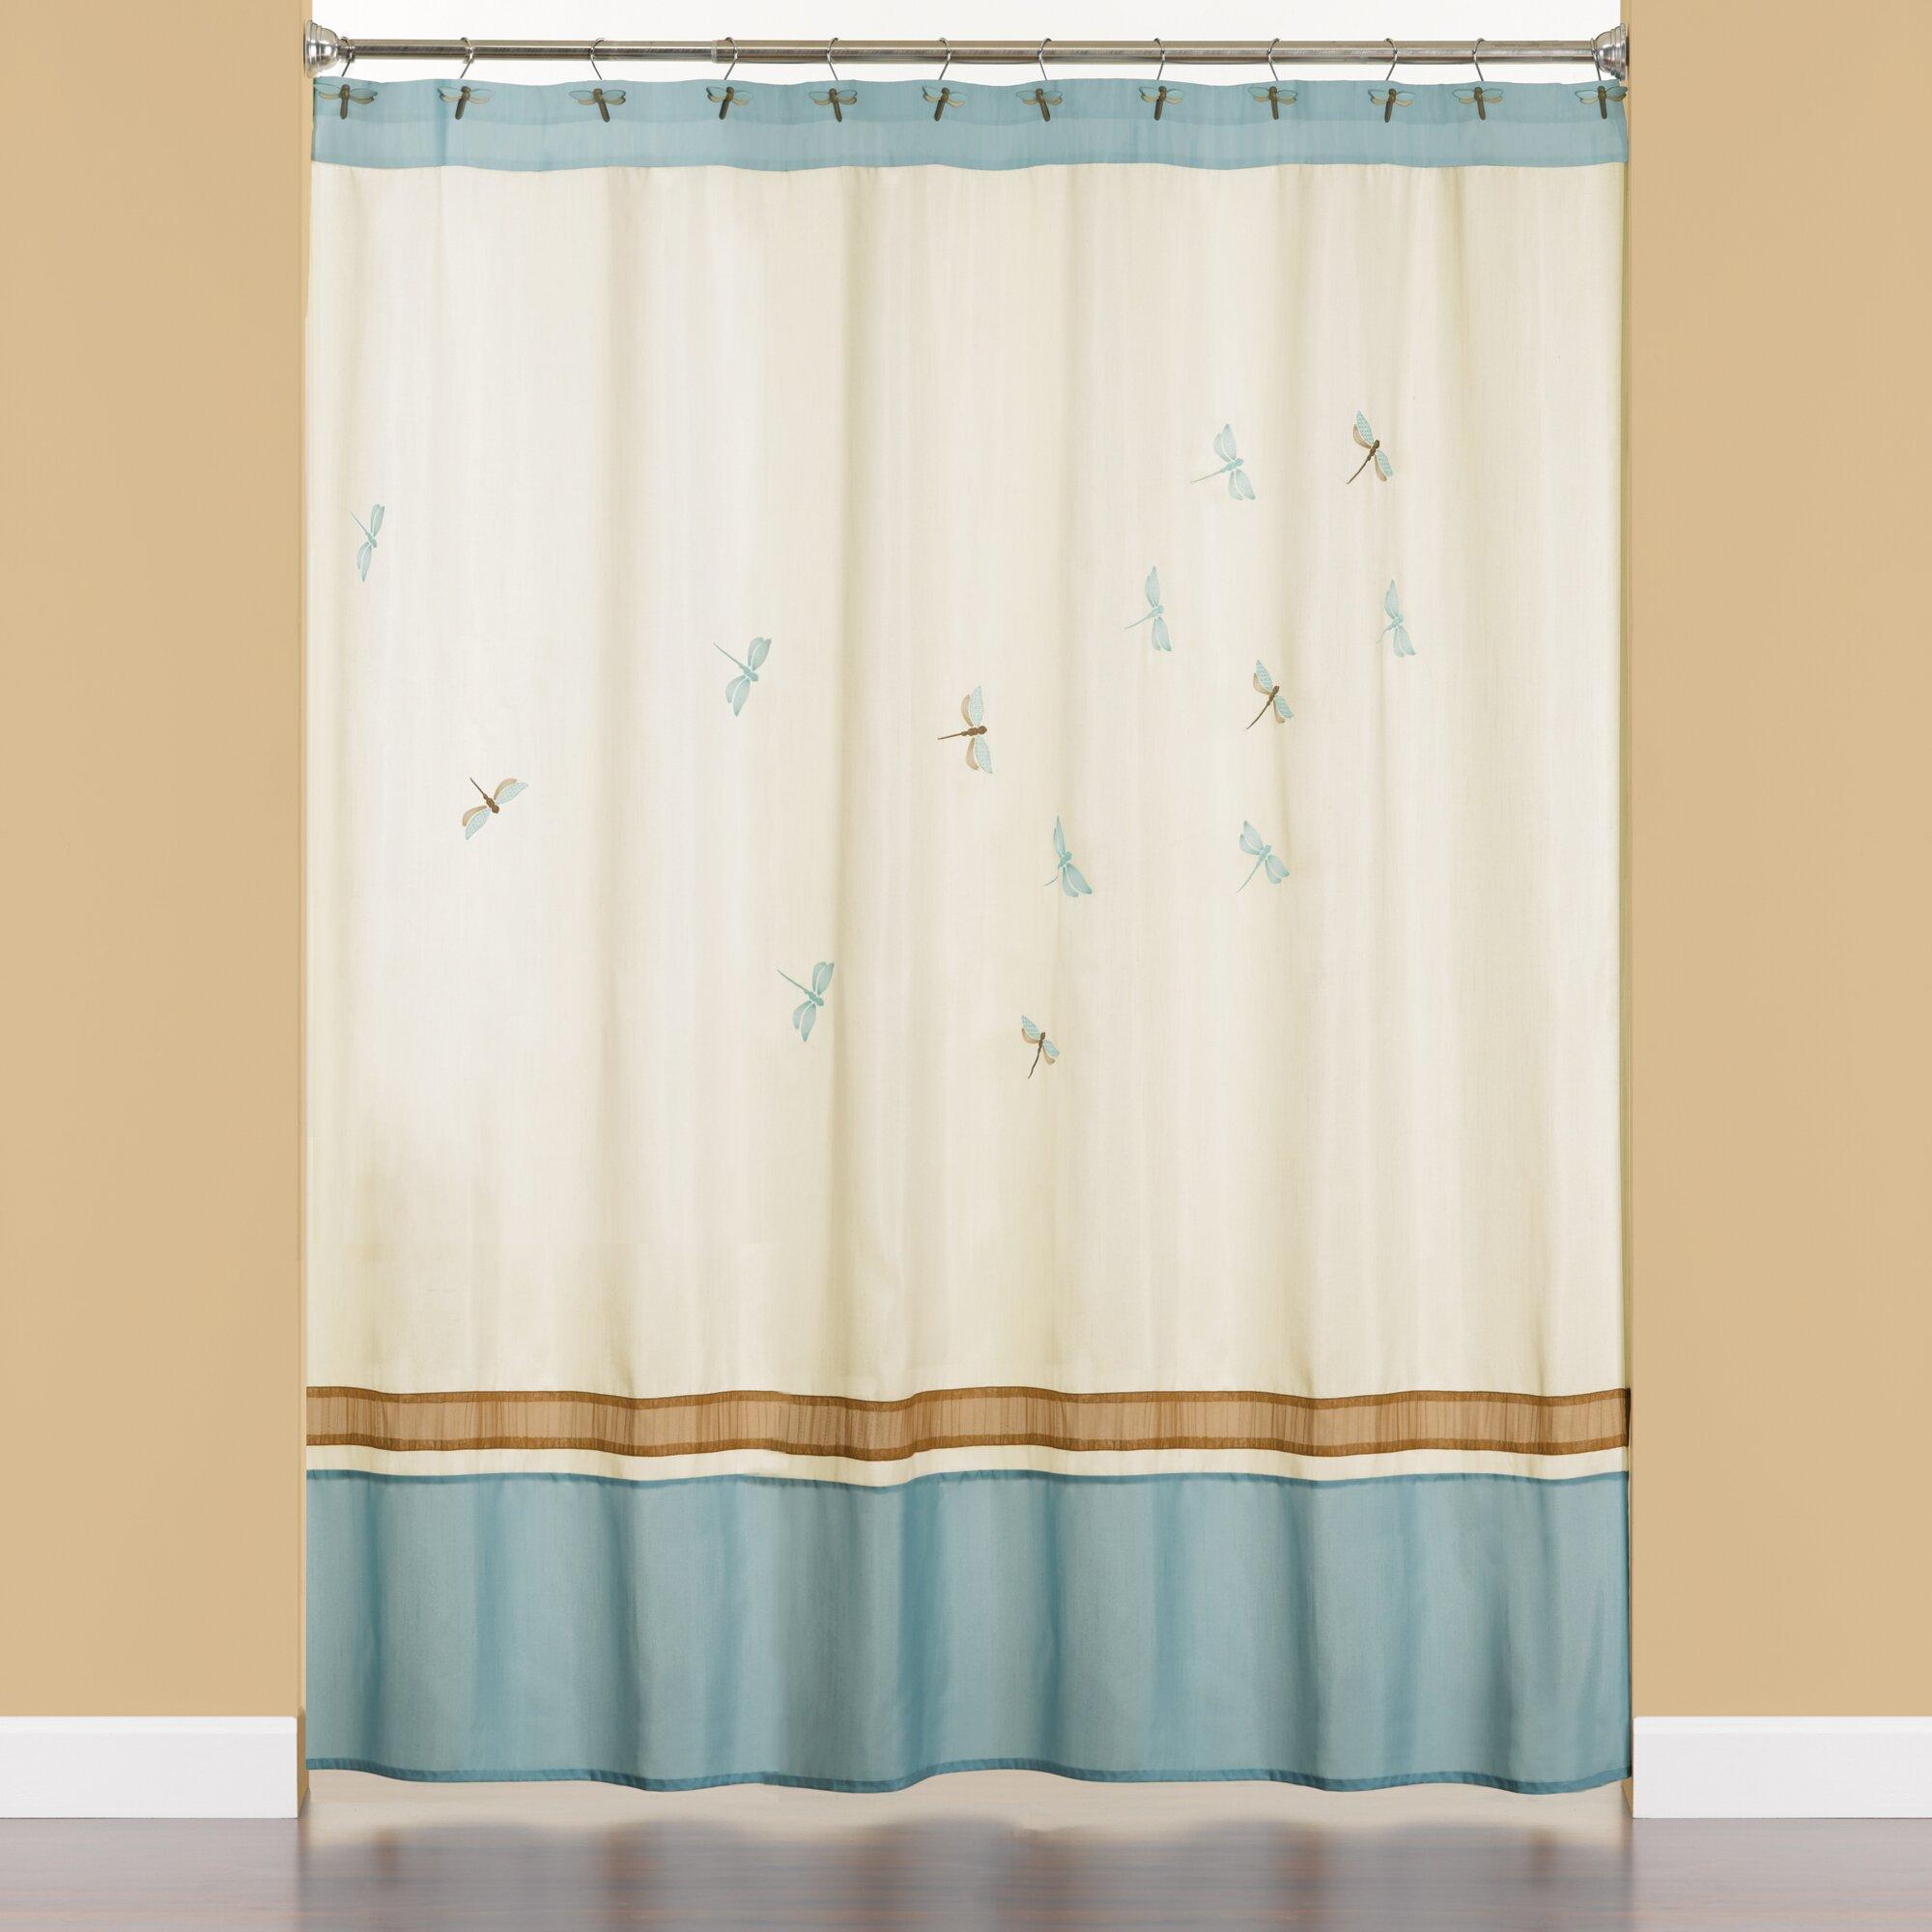 Belk curtains